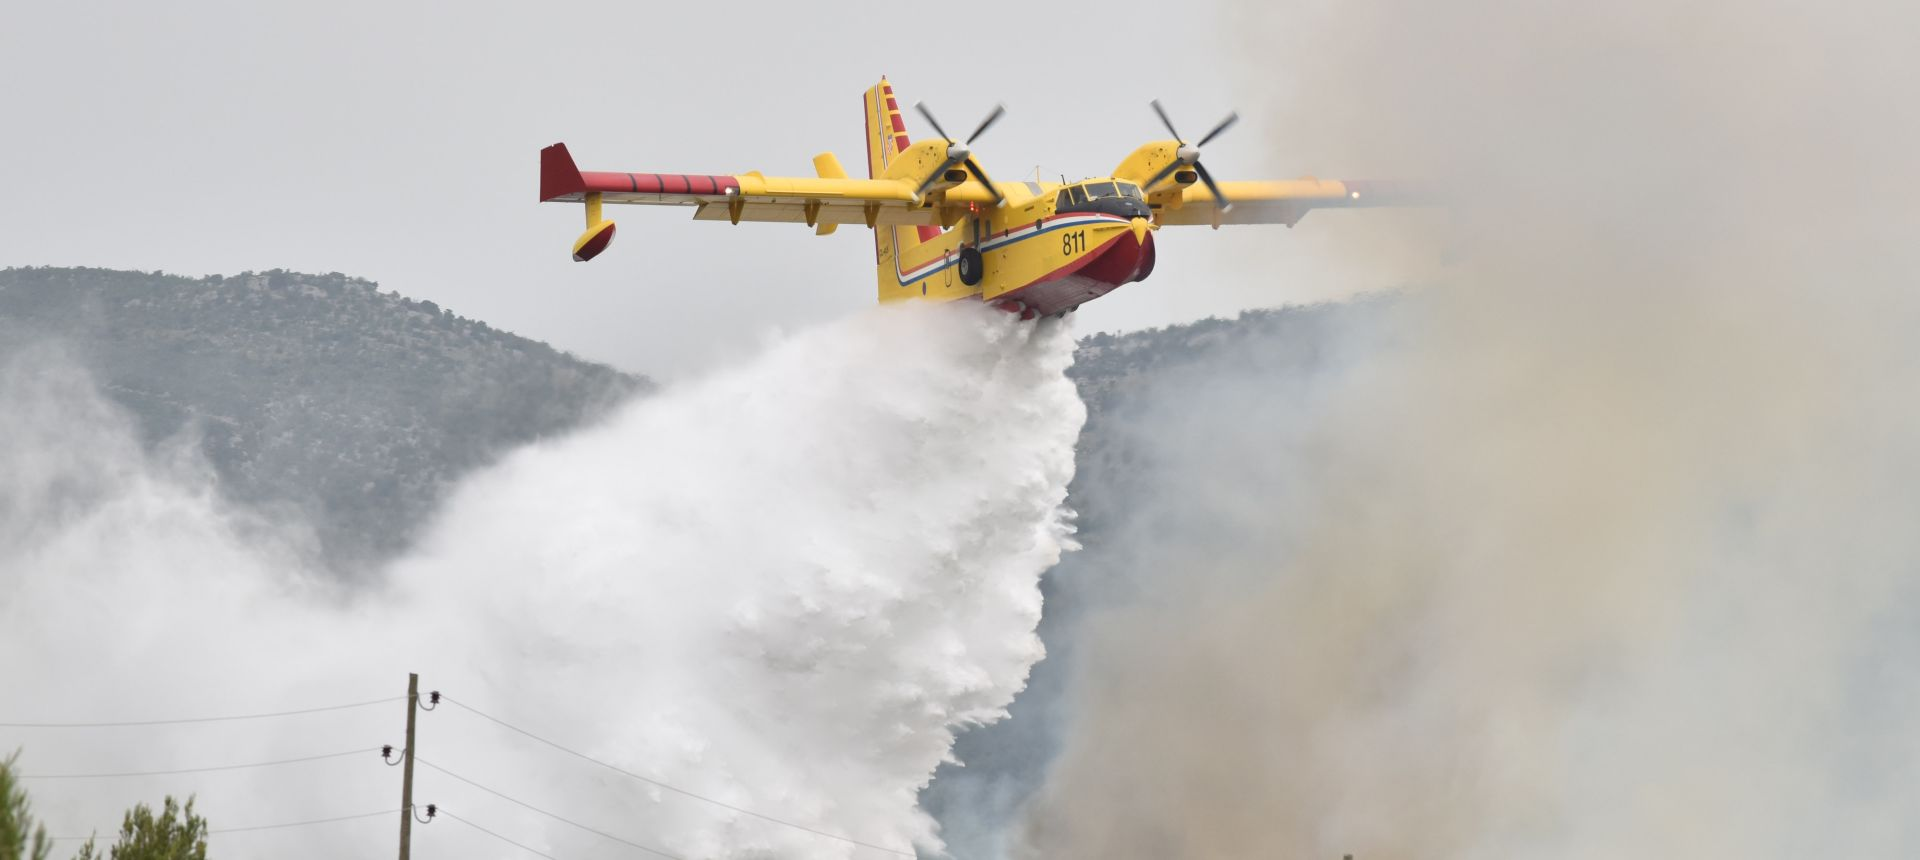 Zračne snage HRZ-a i PZO-a ugasile požare kod Vodica i na Dugom otoku